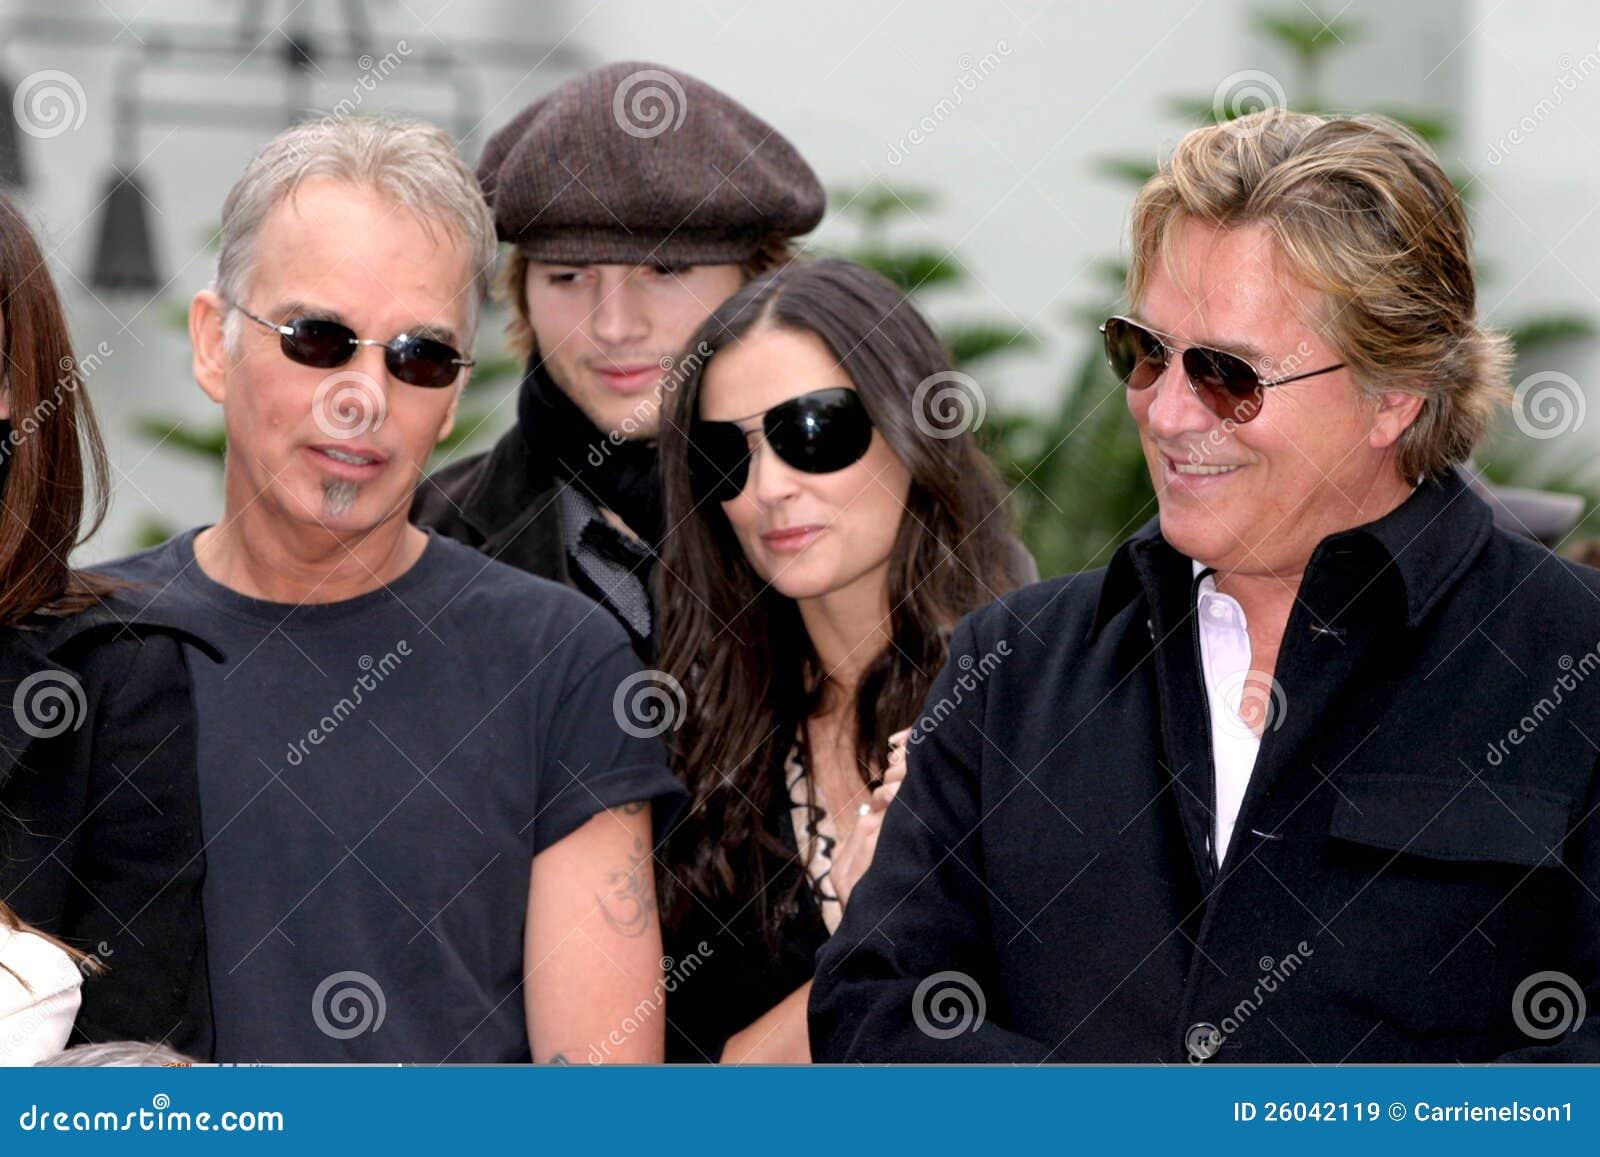 Ashton Kutcher, Billy Bob Thornton, Demi Moore, Don Johnson, Bruce Willis, PLOMBS Thornton de Billy